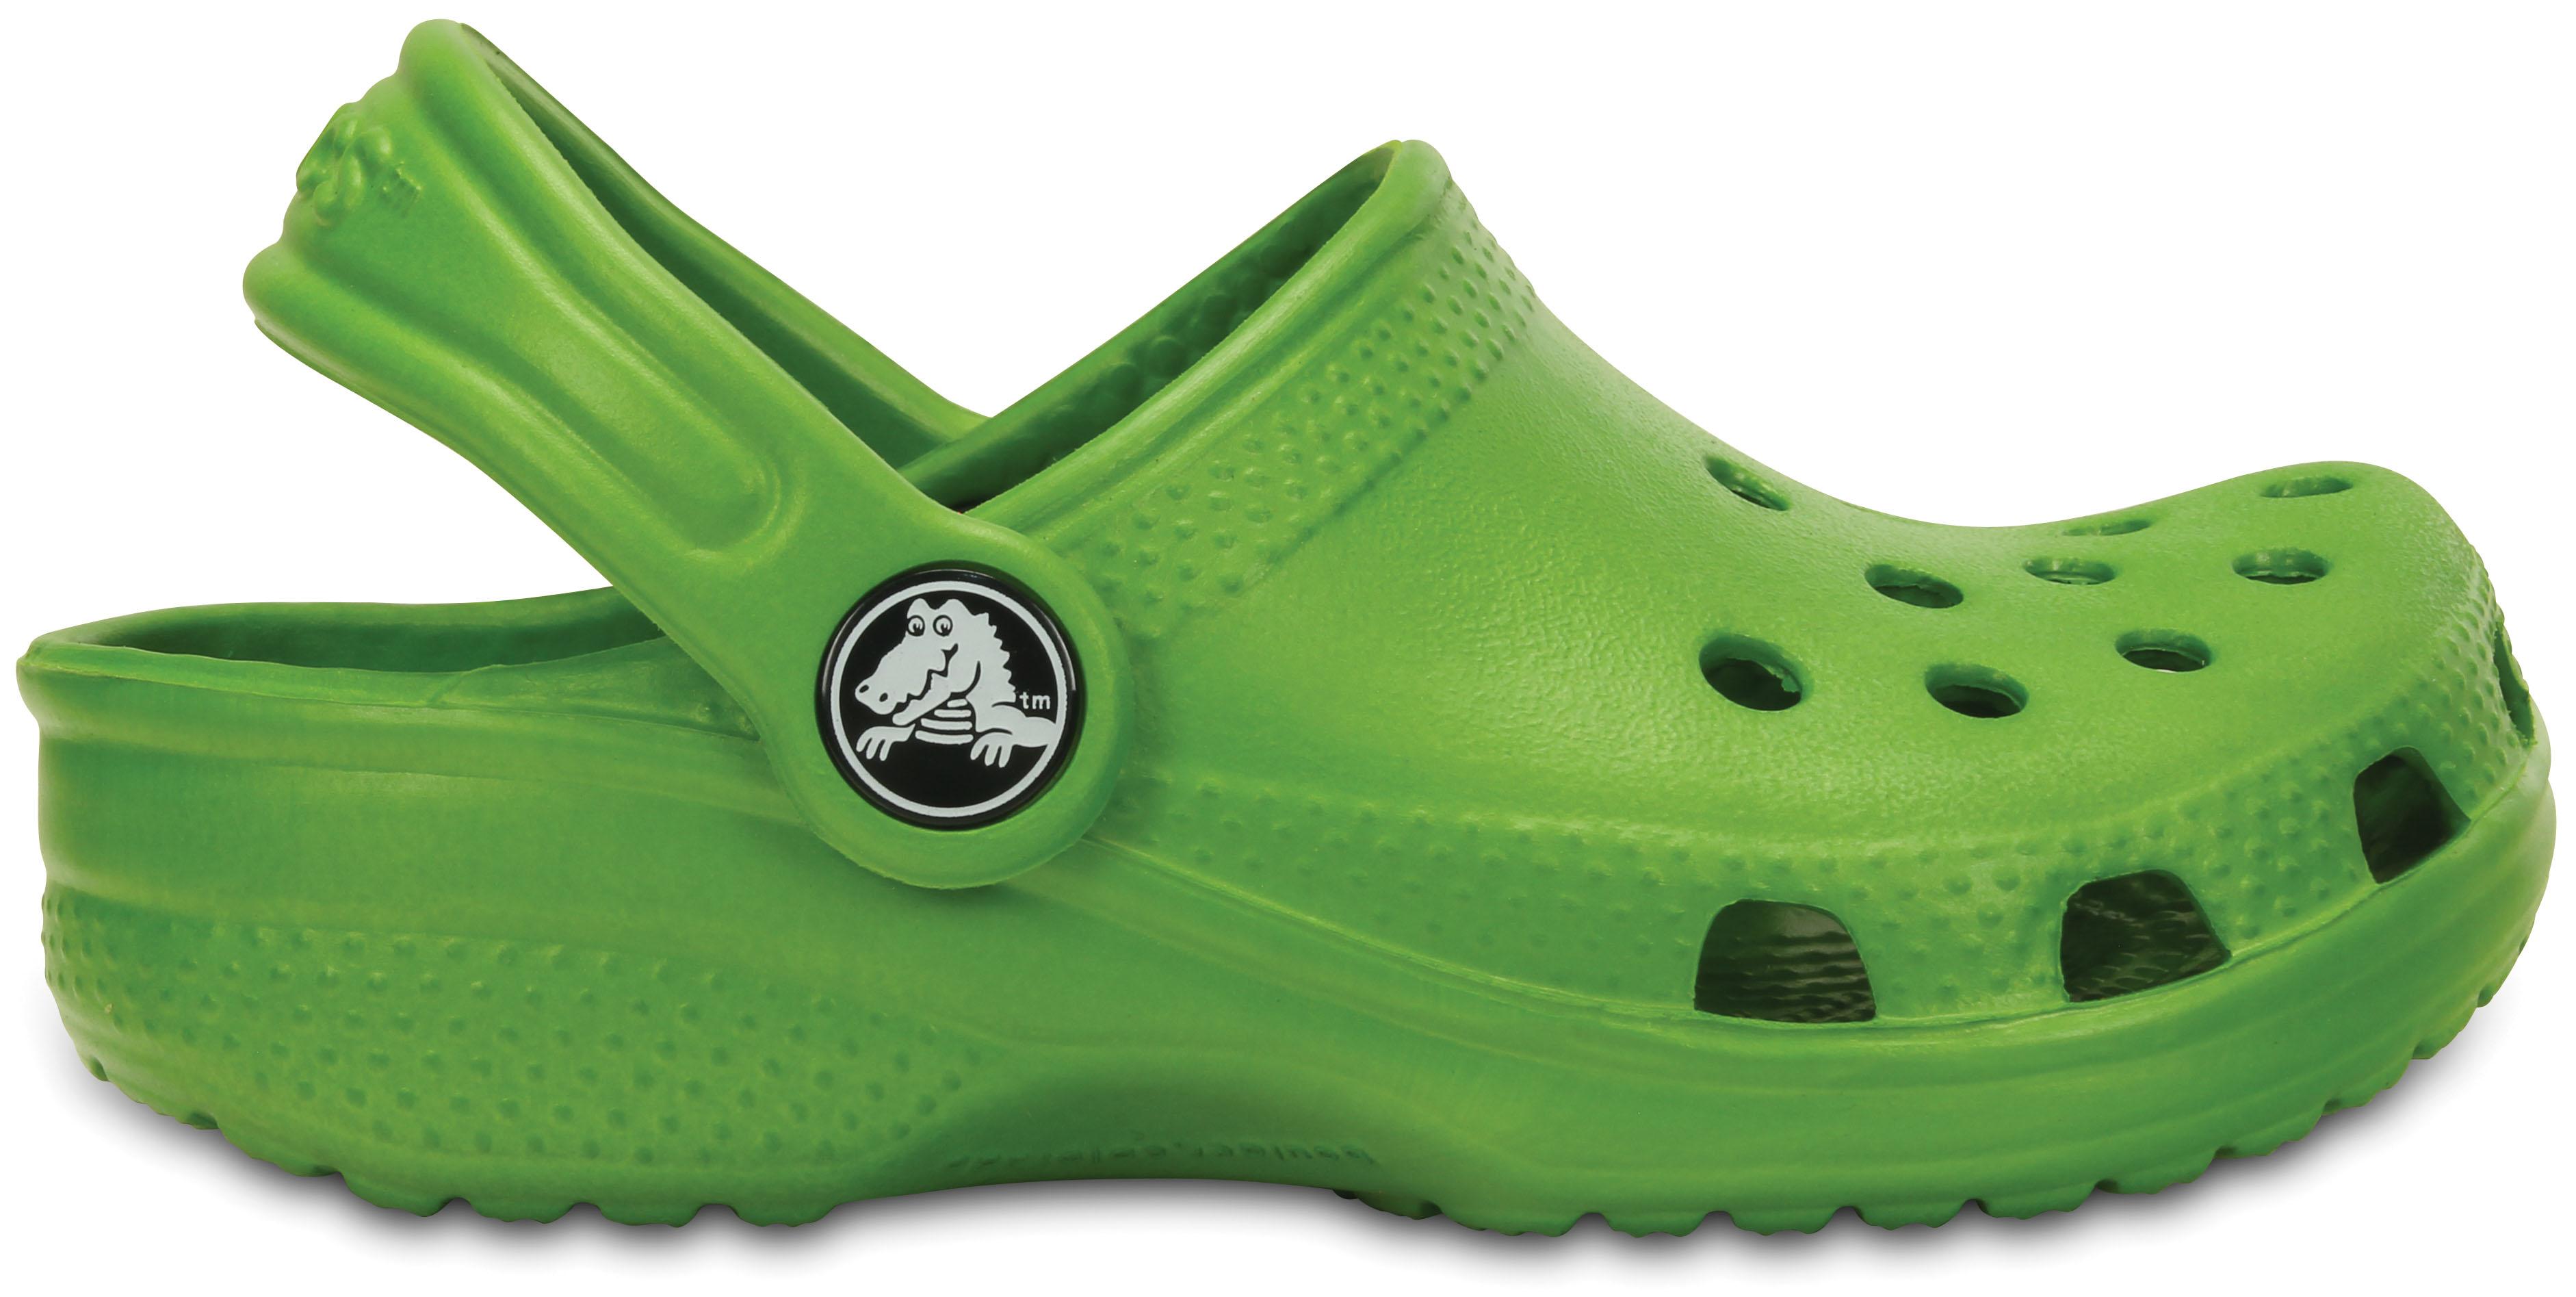 Crocs Classic Kids - Parrot Green C6C7